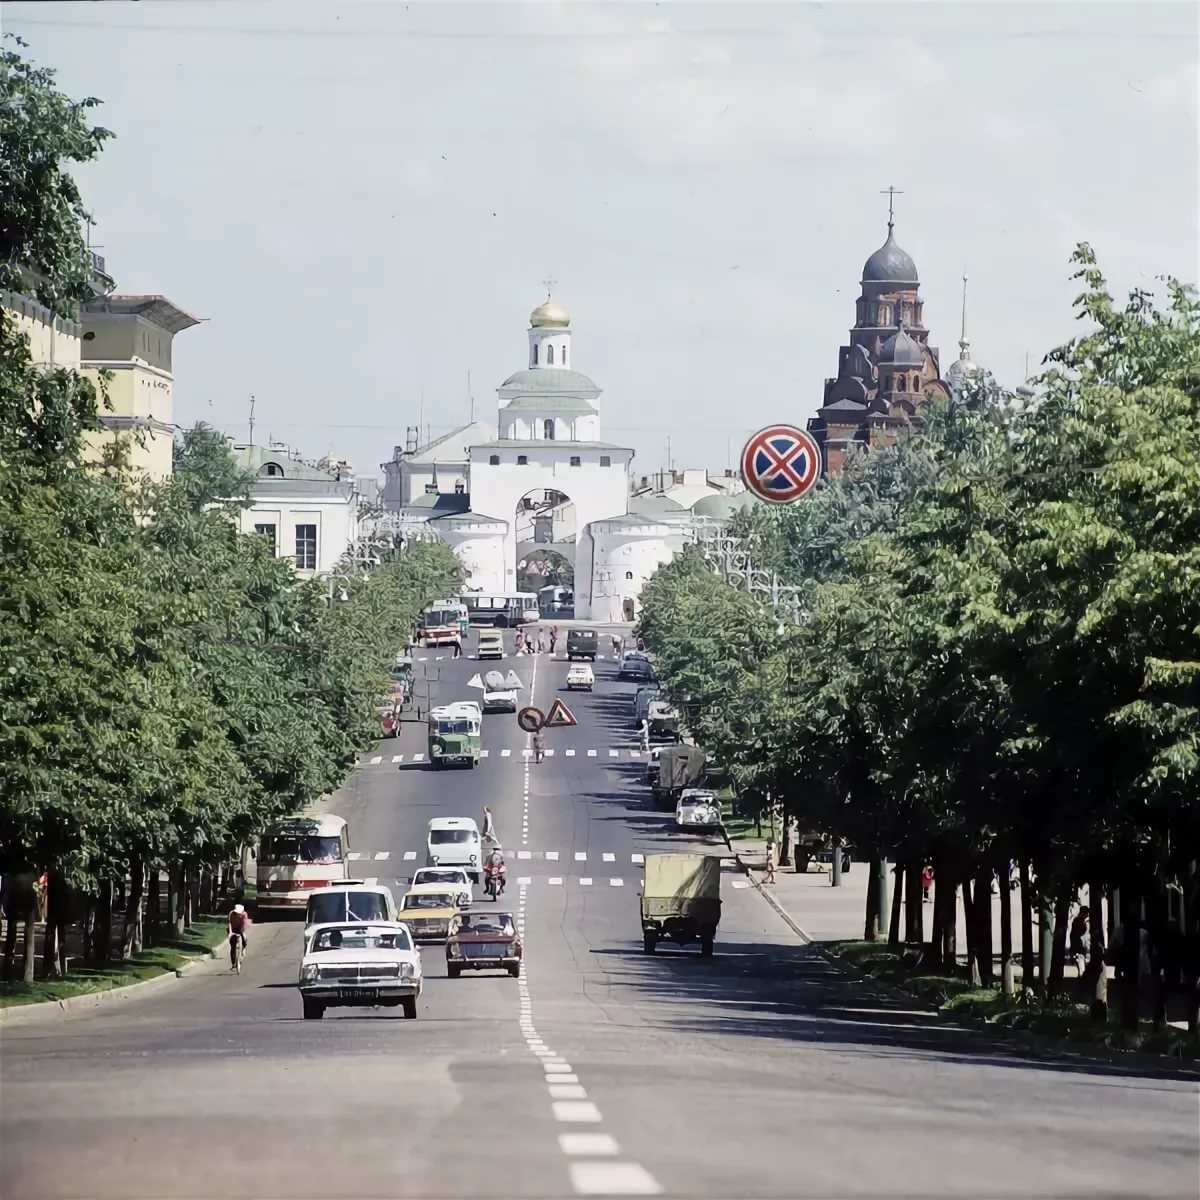 1979 Улица Московская (Дворянская). Николай Зайцев, РИА